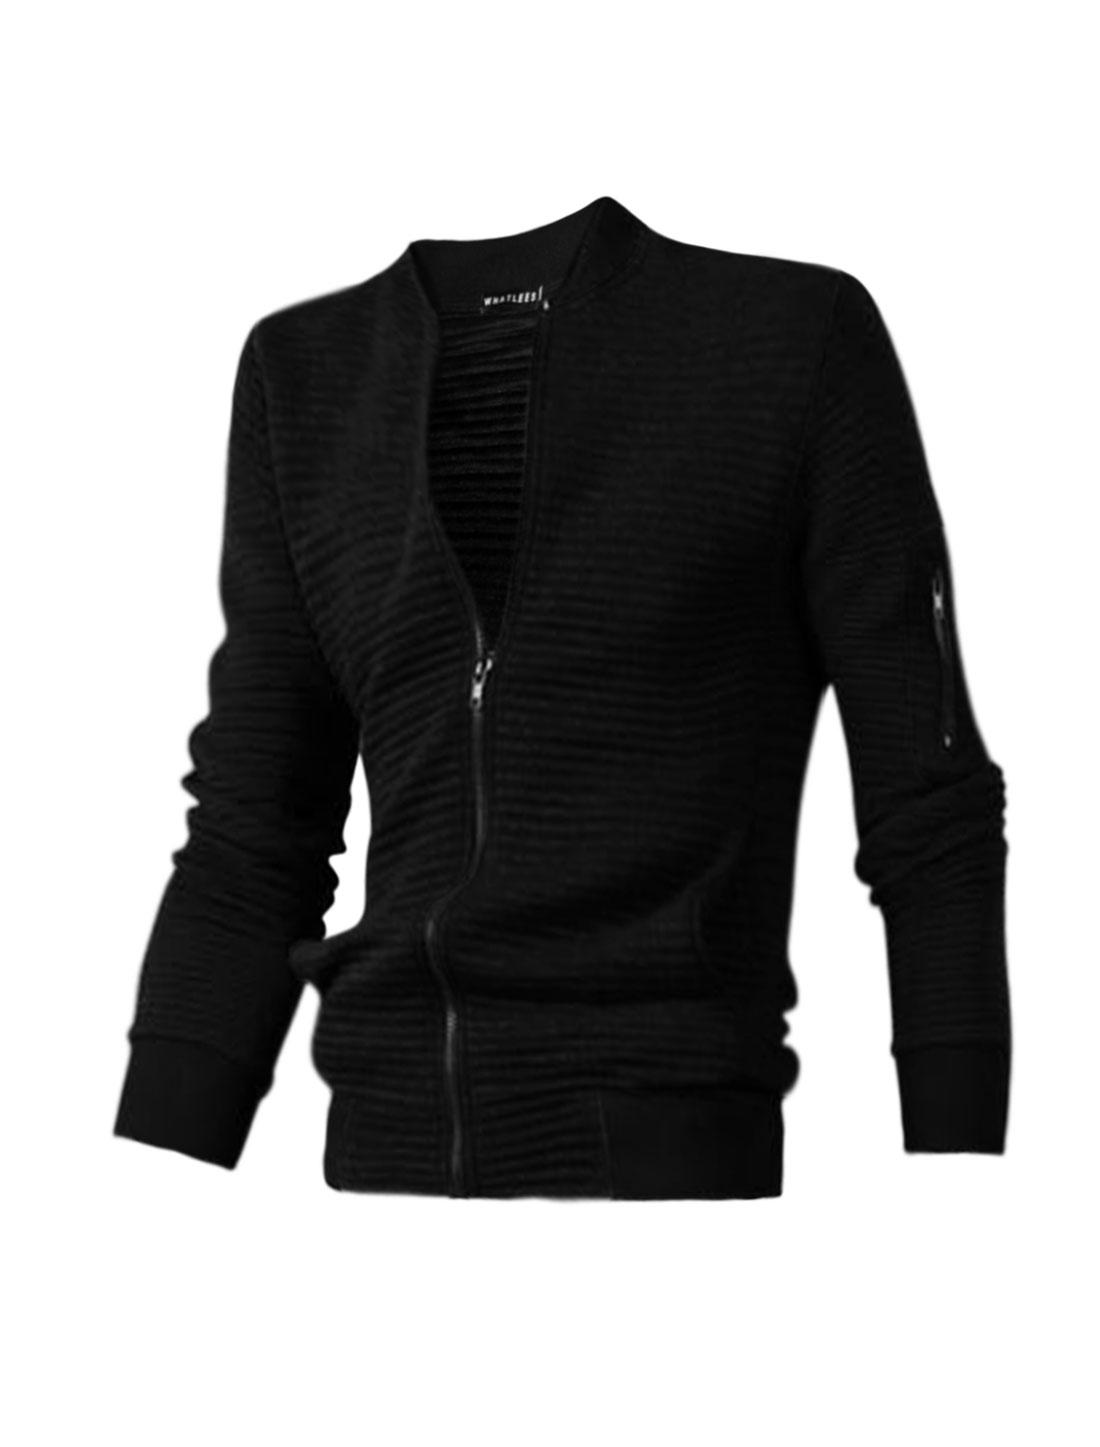 Man Stand Collar Textured Slim Fit Jacket Black M